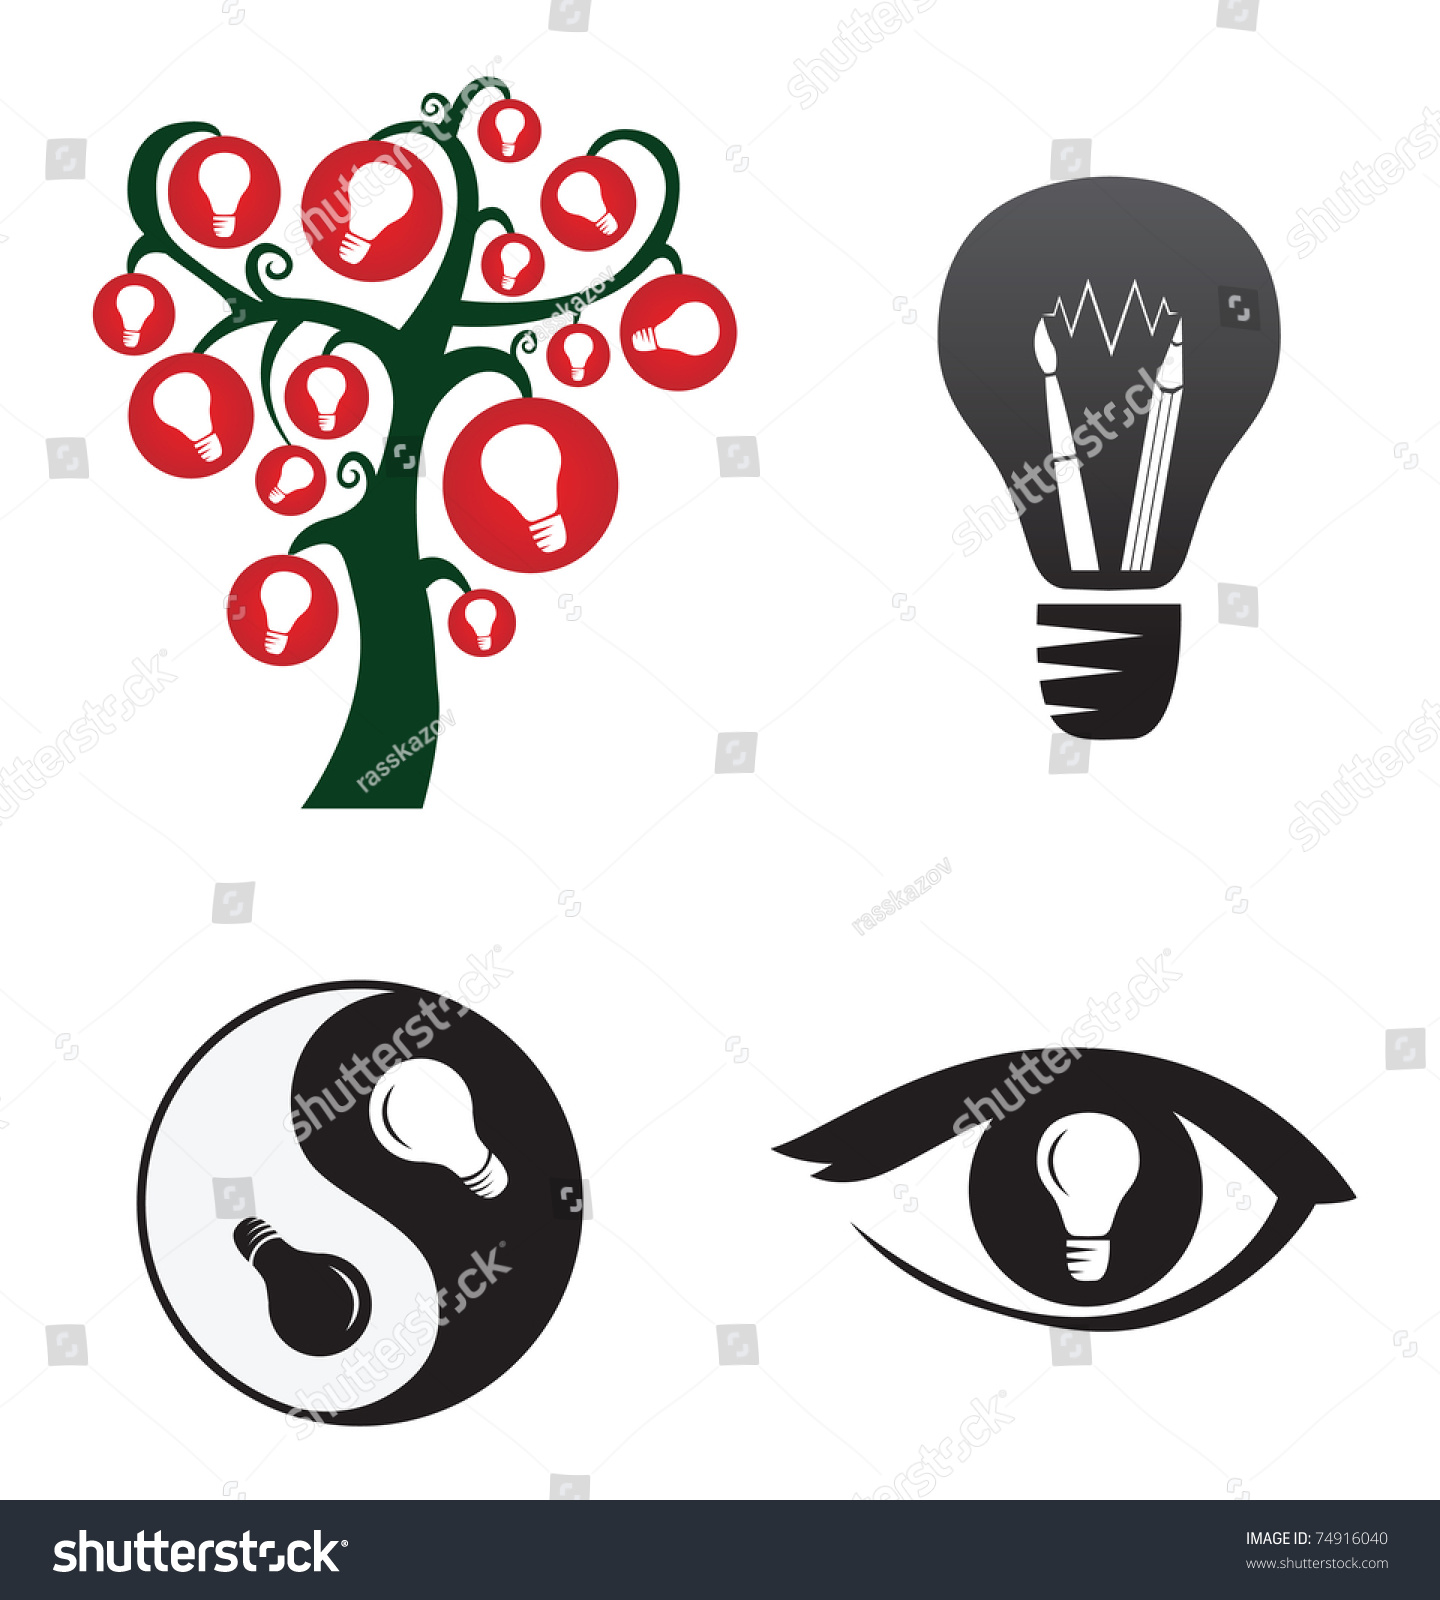 symbols creativity ideas stock vector 74916040 shutterstock